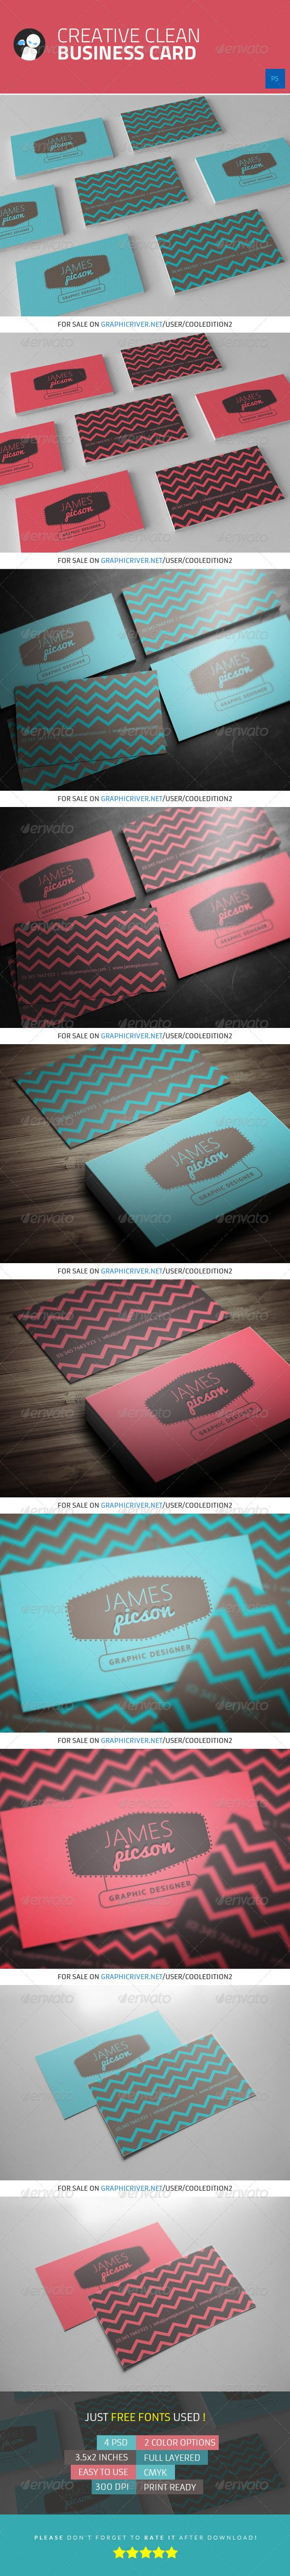 3023 best Nice Business Cards on Pinterest images on Pinterest